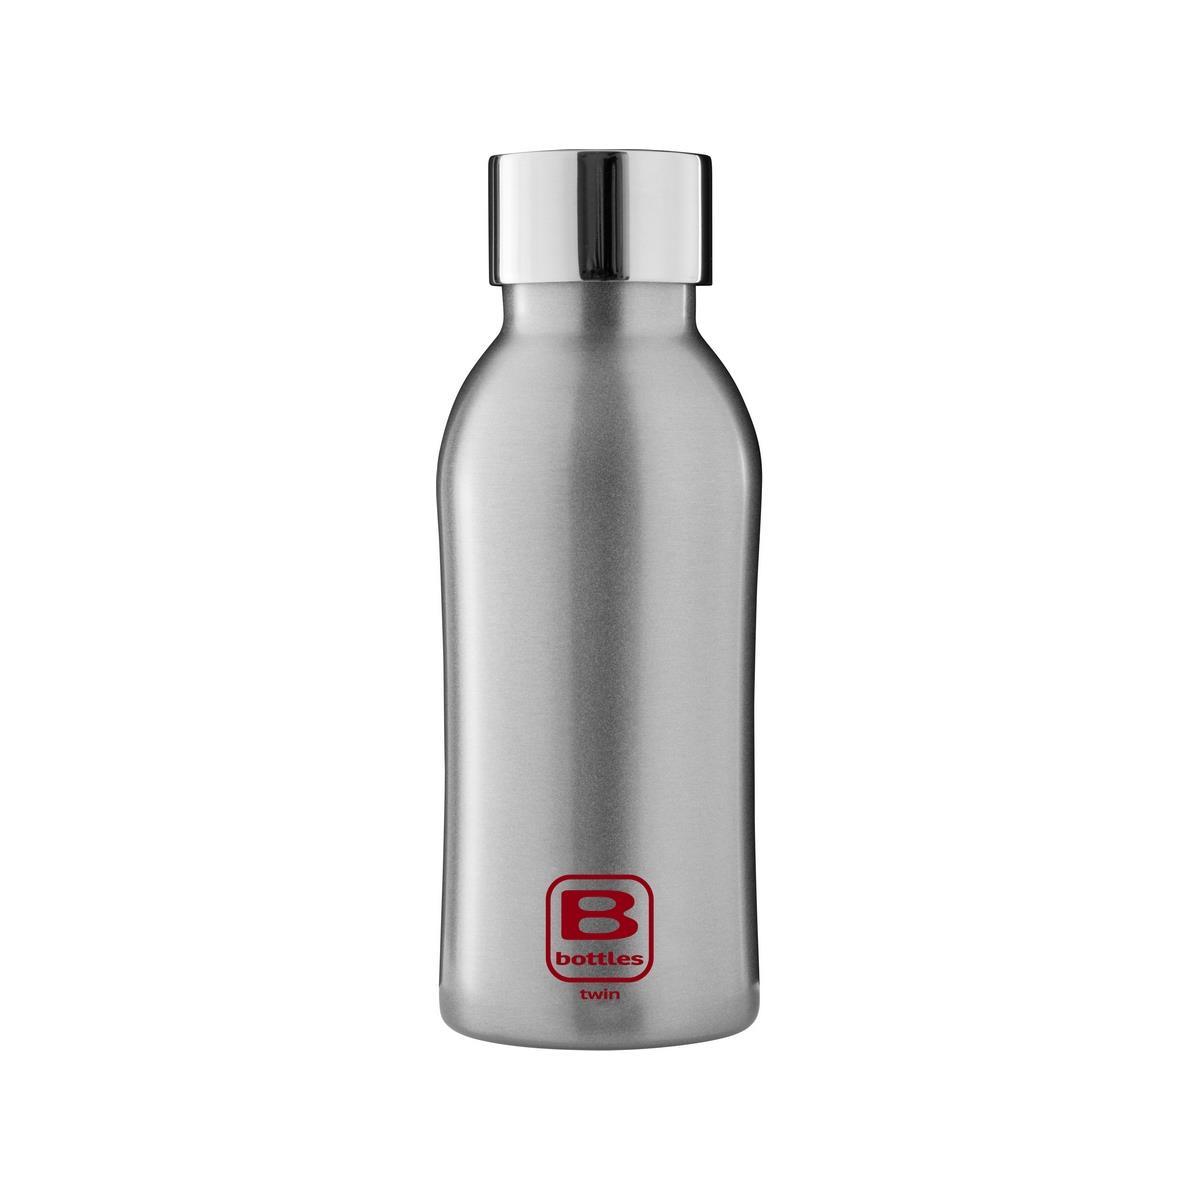 B Bottles Twin - Silver Brushed - 350 ml - Bottiglia Termica a doppia parete in acciaio inox 18/10